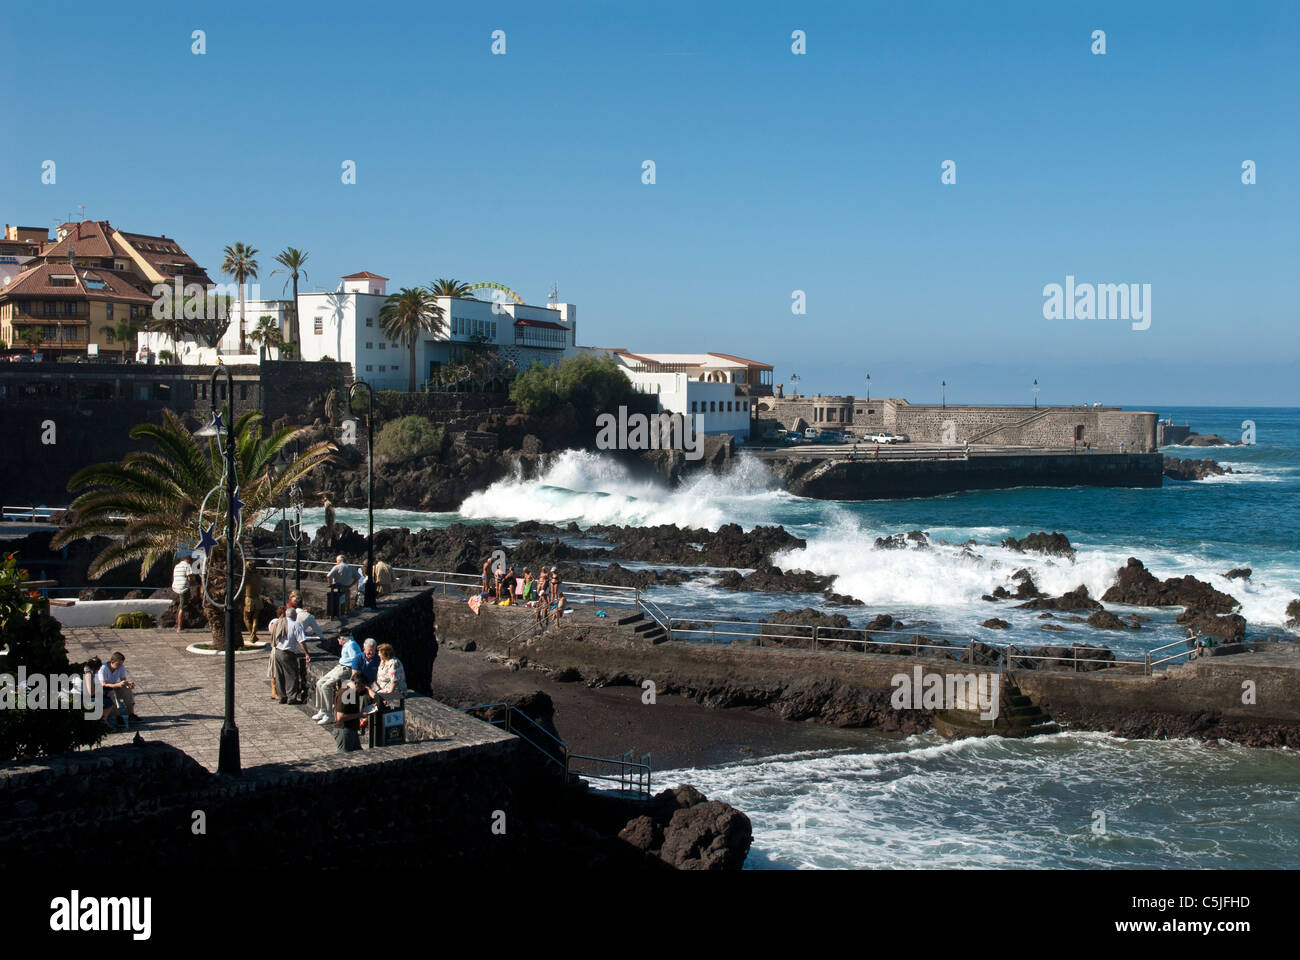 Die Promenade Gegend und Meer Ufer mit brechenden Wellen. Puerto De La Cruz, Teneriffa, Spanien Stockfoto